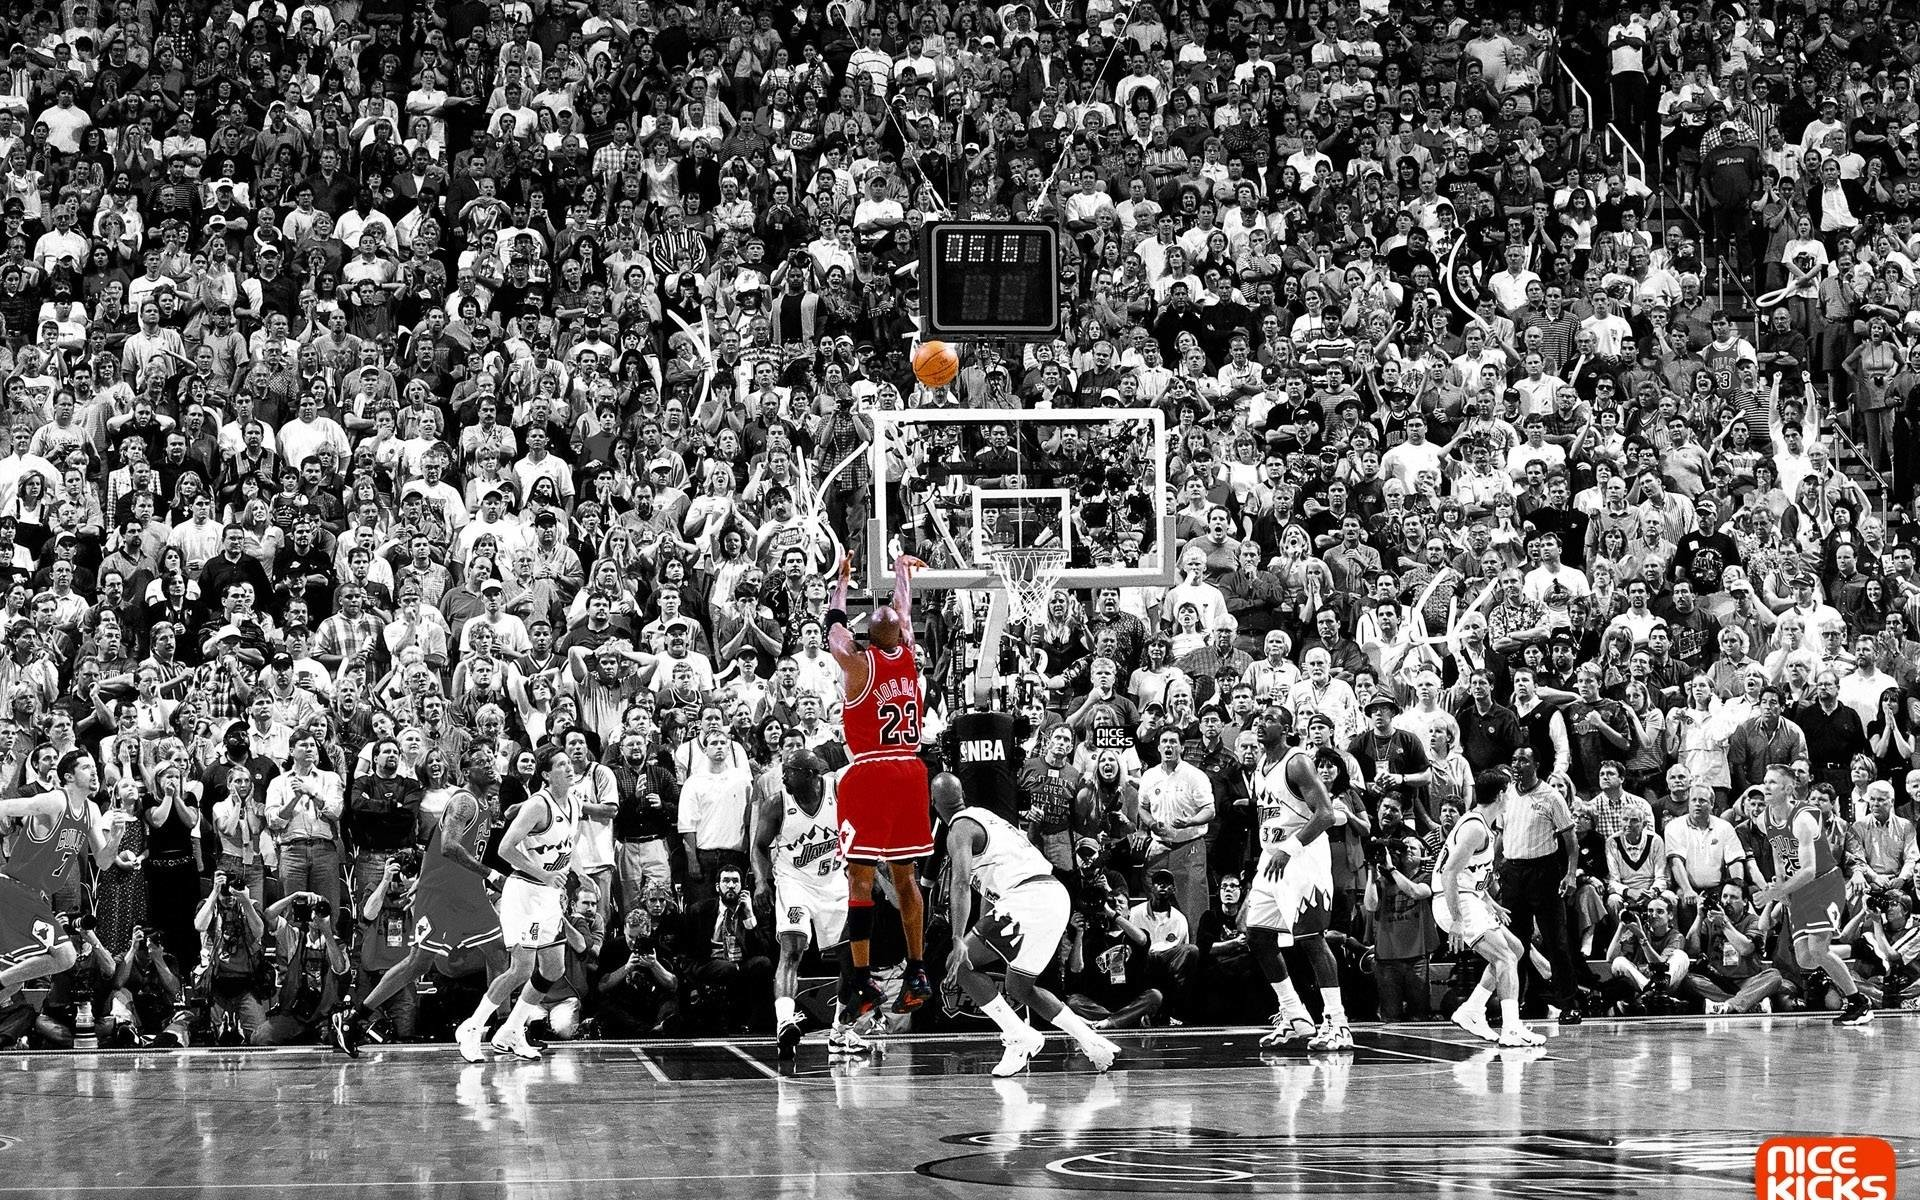 Sports nba basketball michael jordan selective coloring chicago .